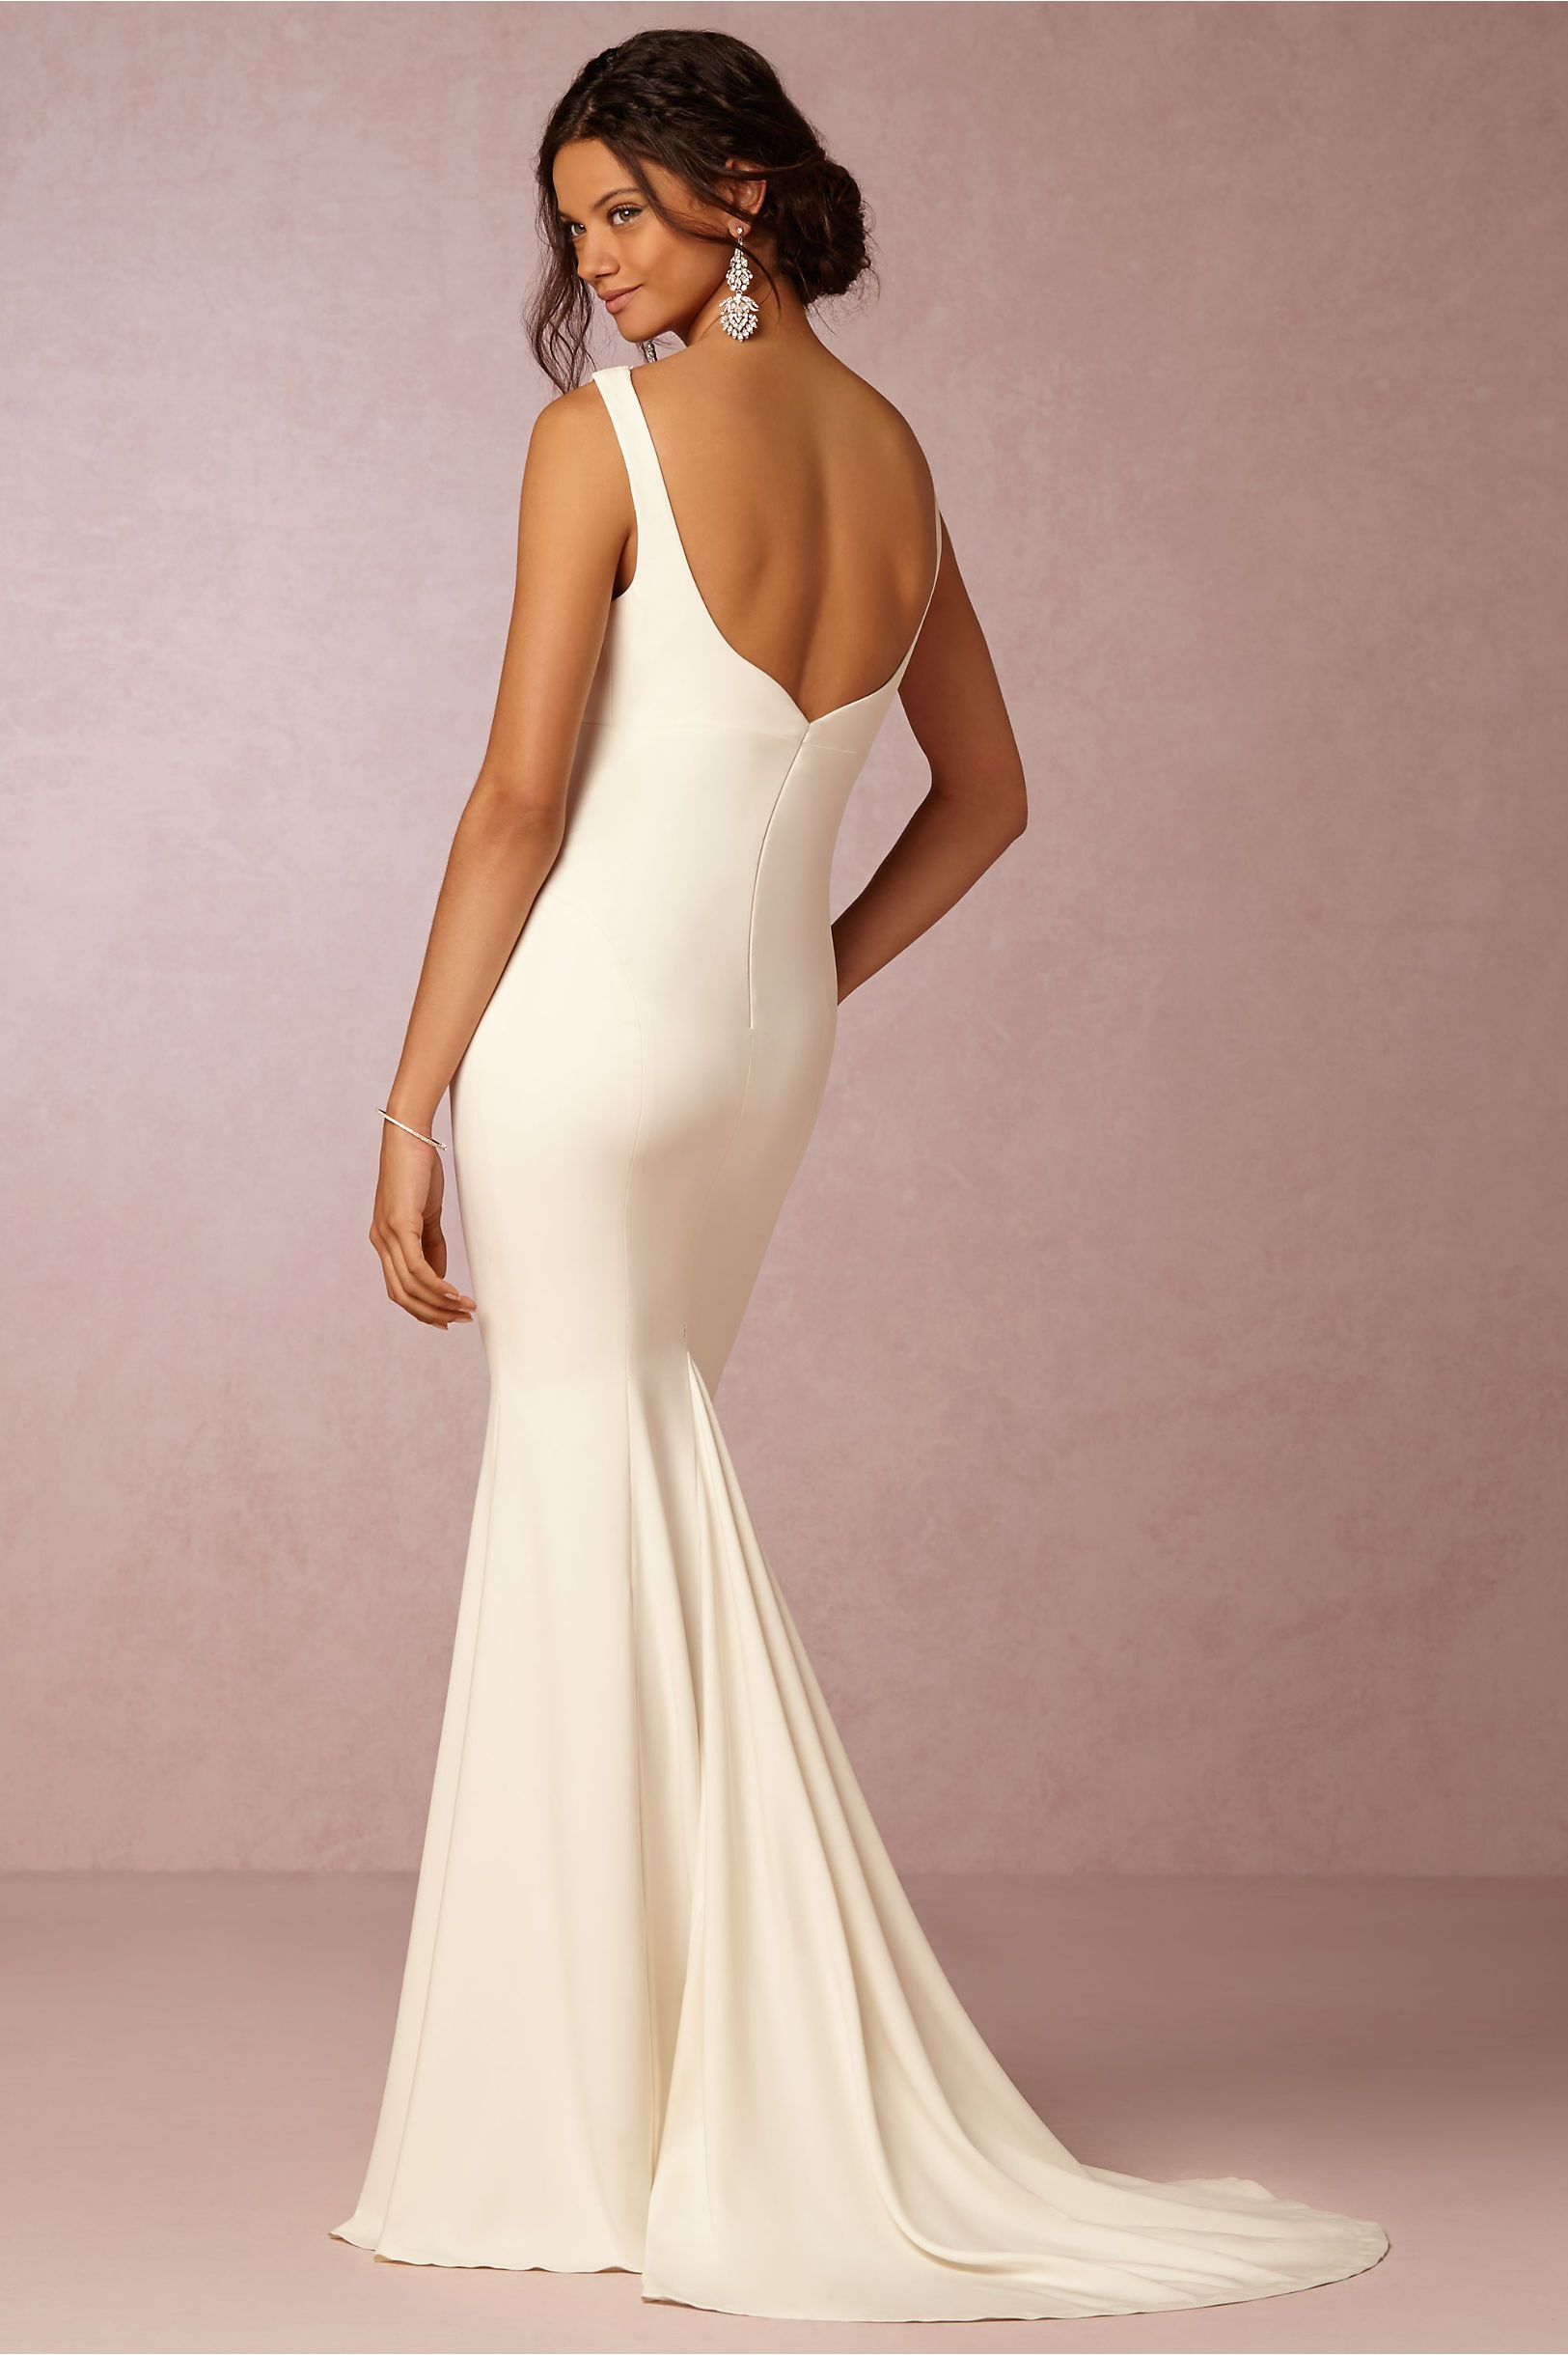 Nicole Miller Wedding Dresses